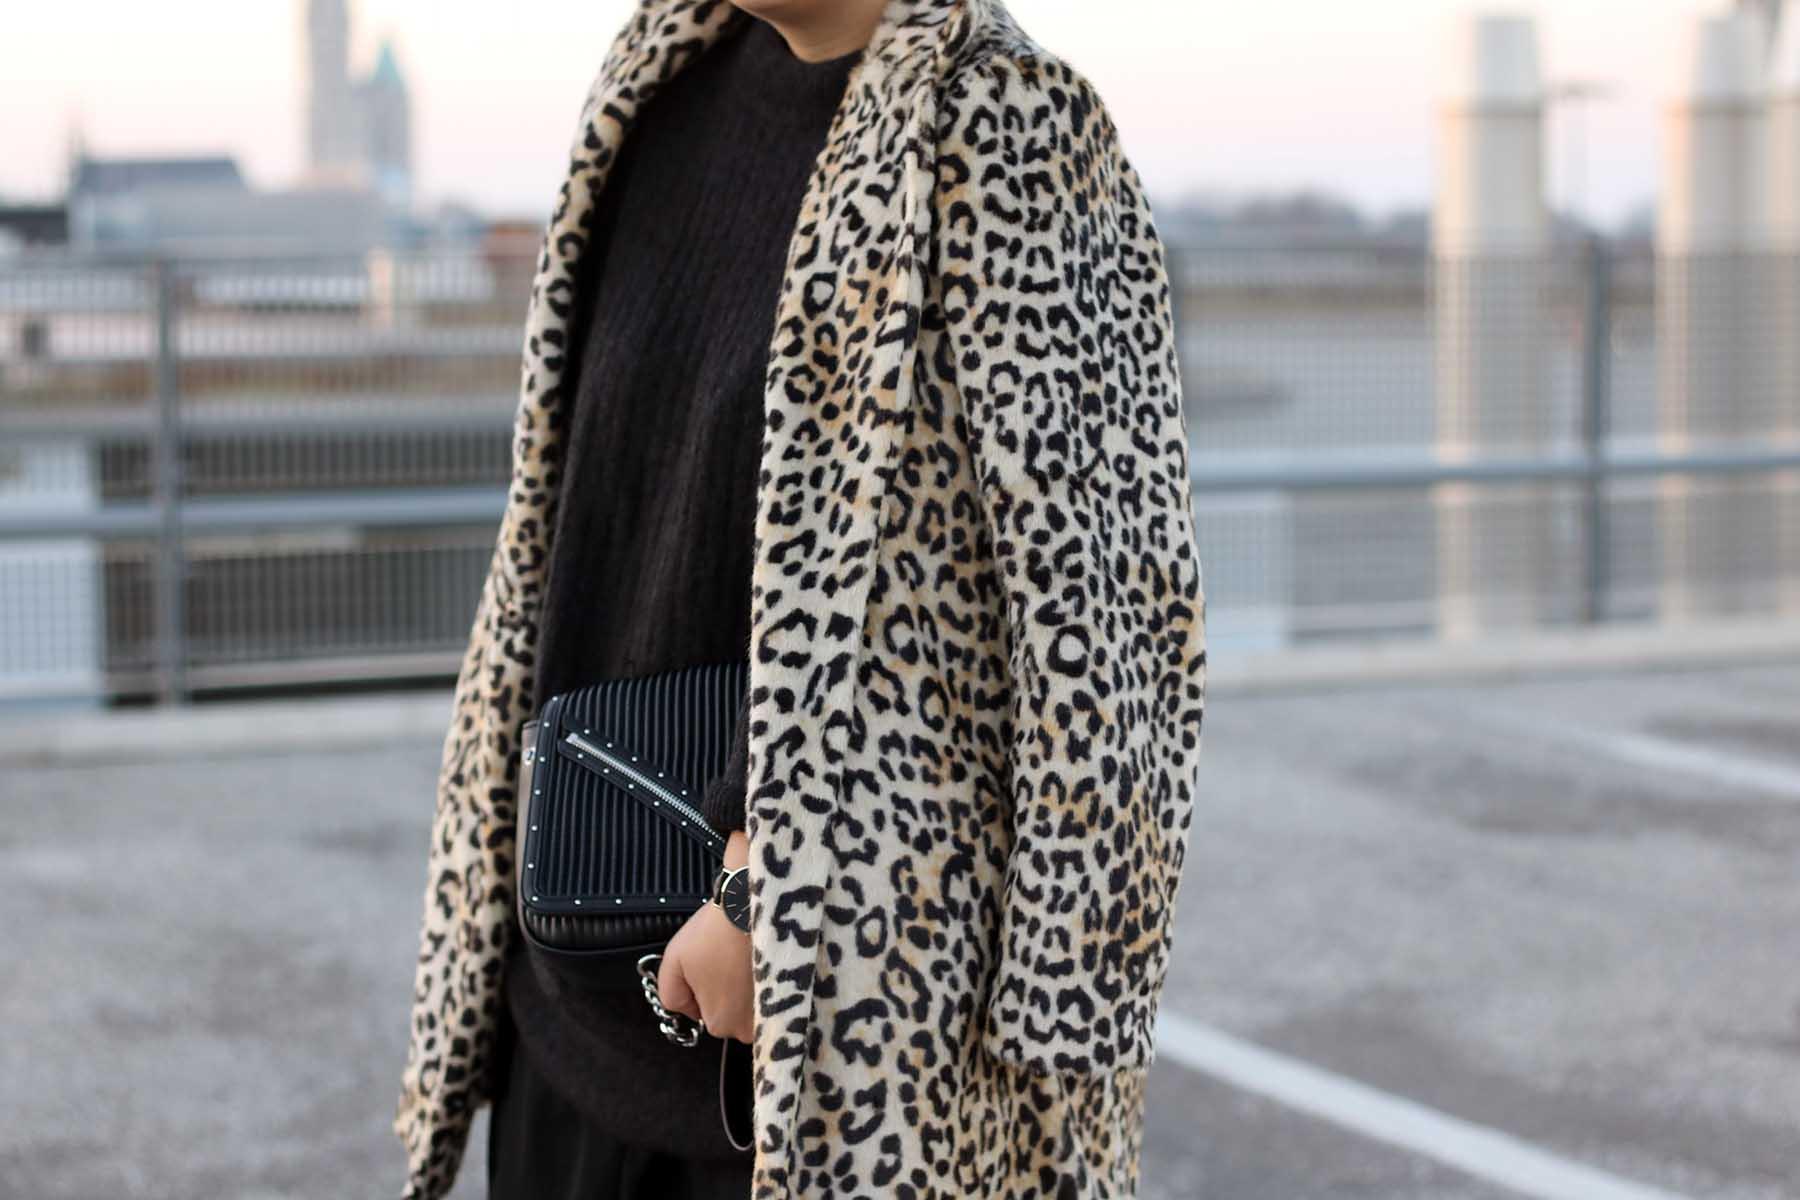 outift-leomantel-mantel-winter-leoparden-modeblog-fashionblog-look-braunschweig13